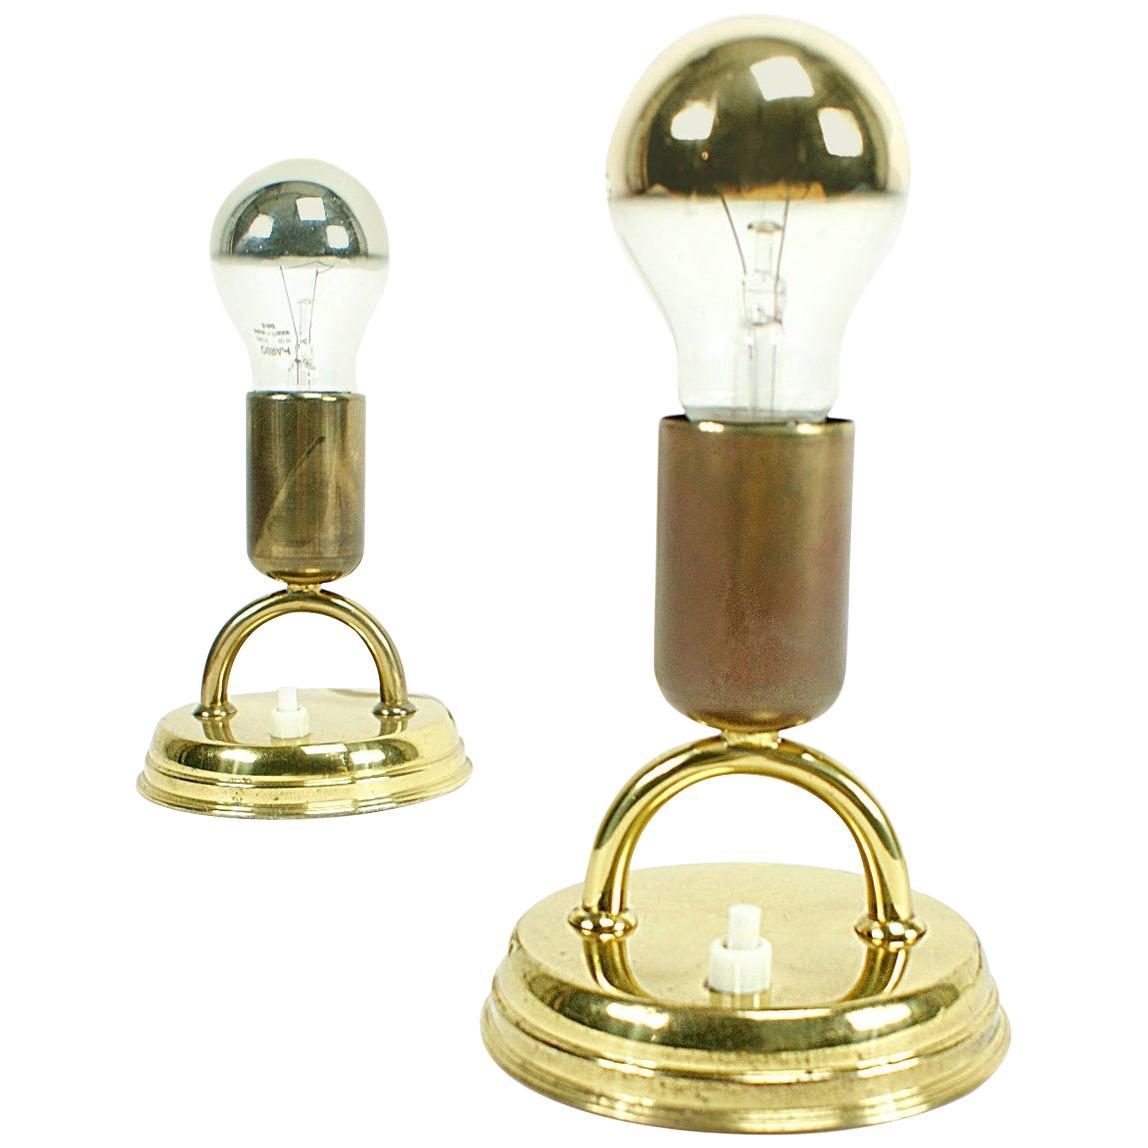 Pair of Midcentury Rupert Nikoll Brass Nightstand Table Lamps, 1950s, Austria